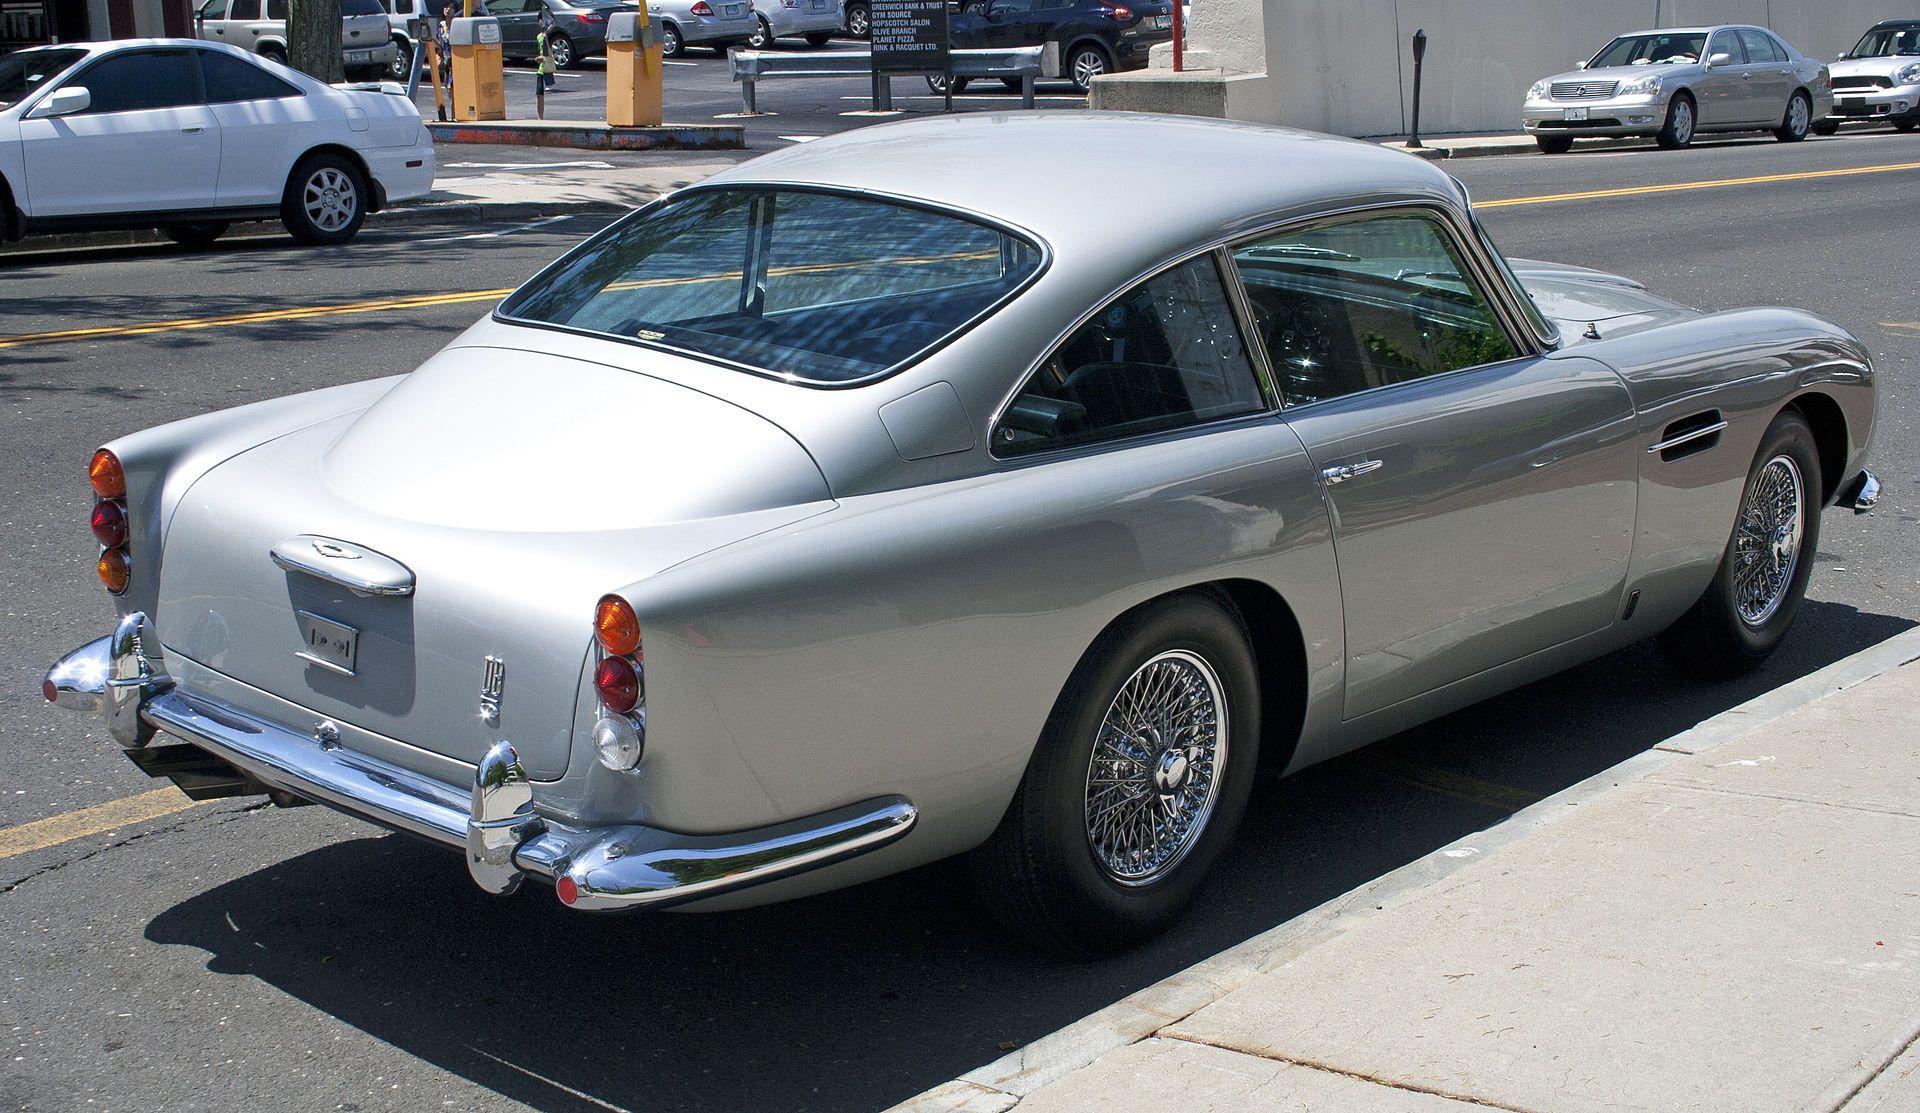 am db5 rear - aston martin db5 - wikipedia, the free encyclopedia